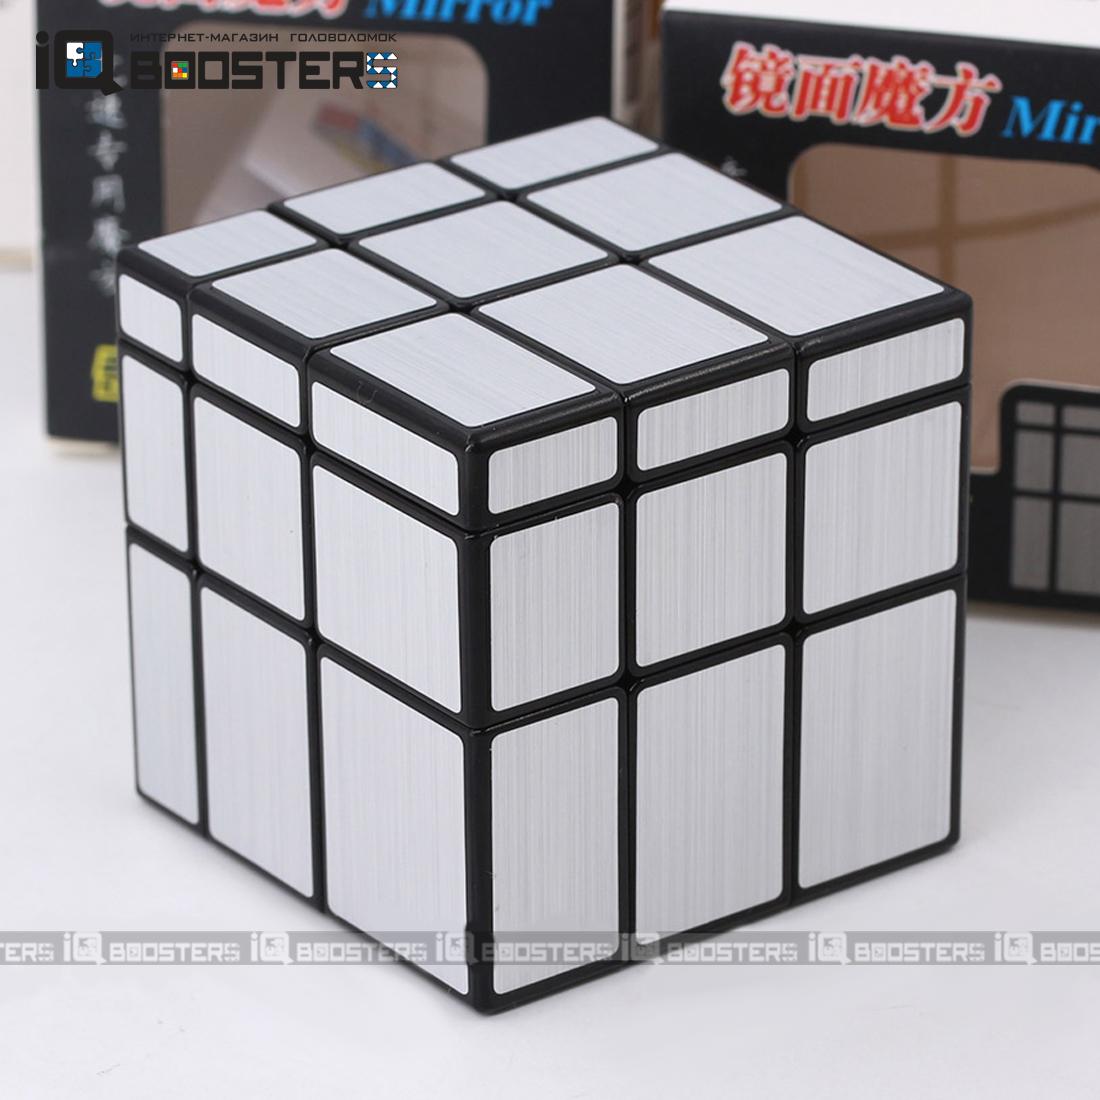 qiyi_mirror_cube_1s